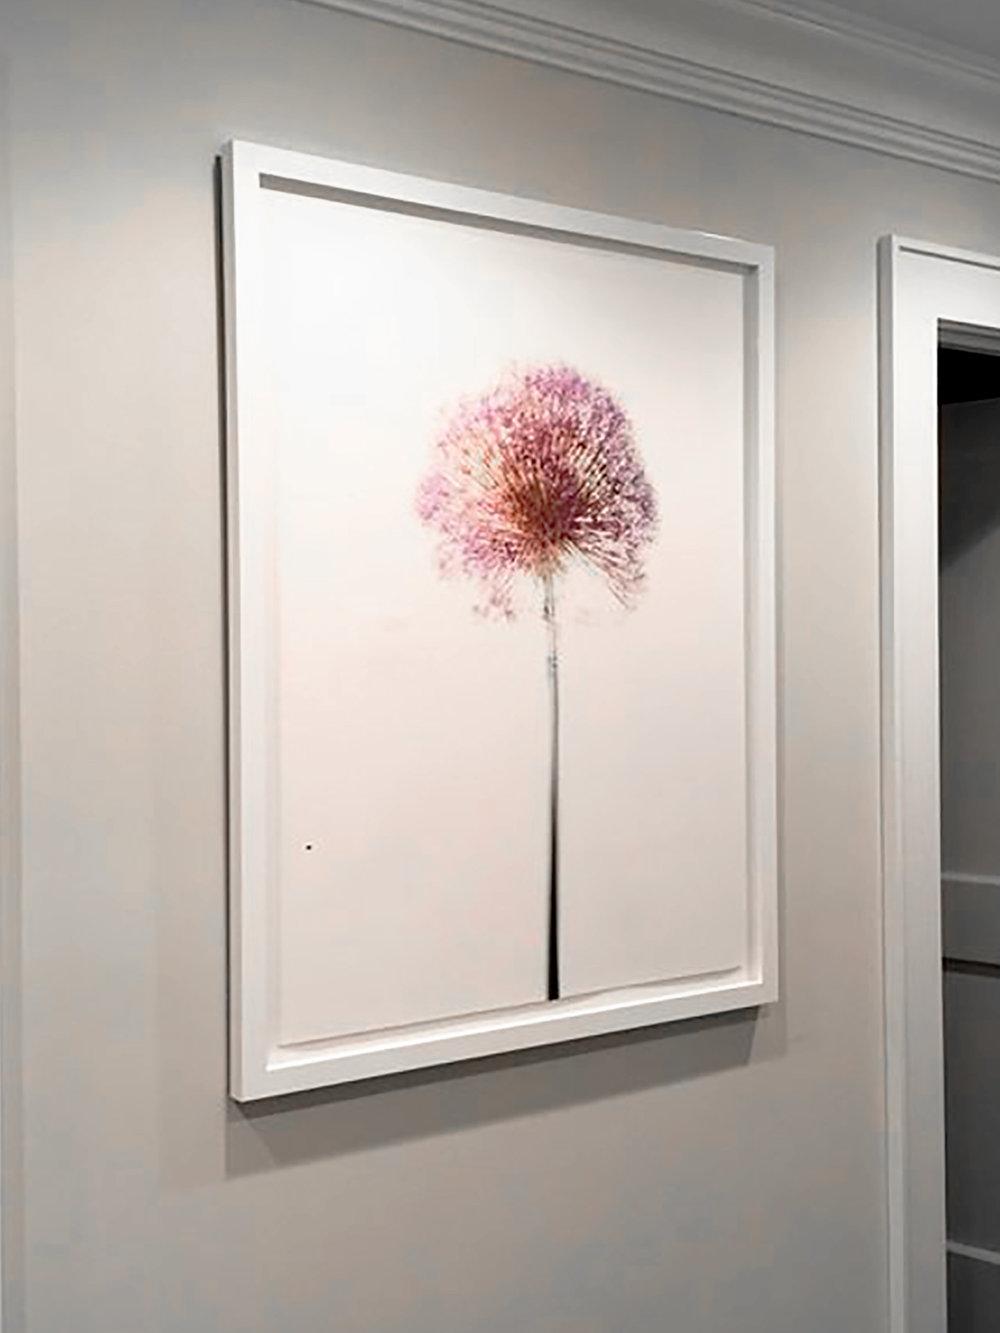 Modern Botanicals, by Shelli Breidenbach